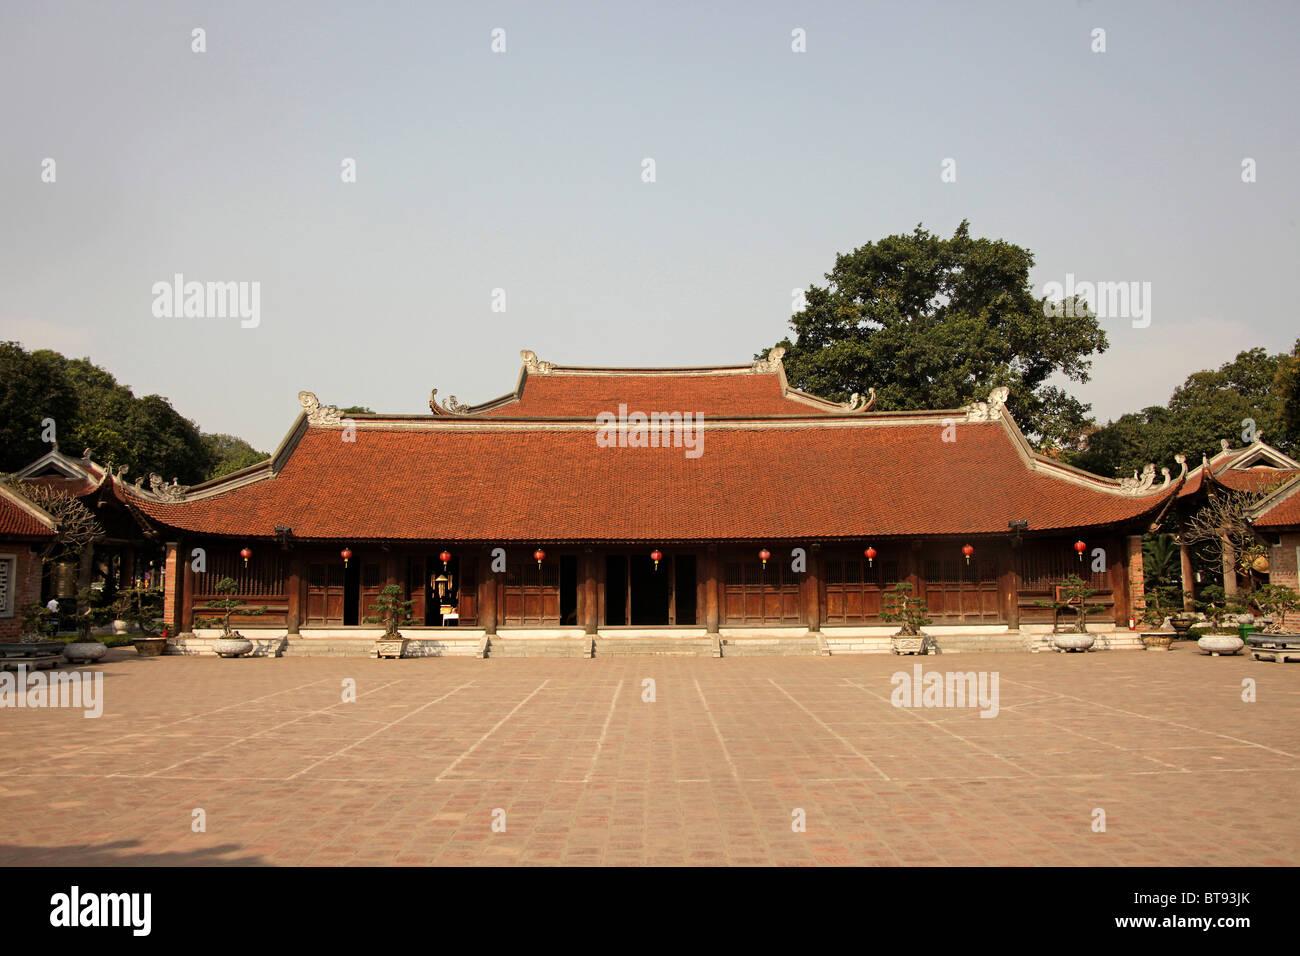 Temple of Literature Van Mieu, Hanoi, Vietnam, Asia - Stock Image